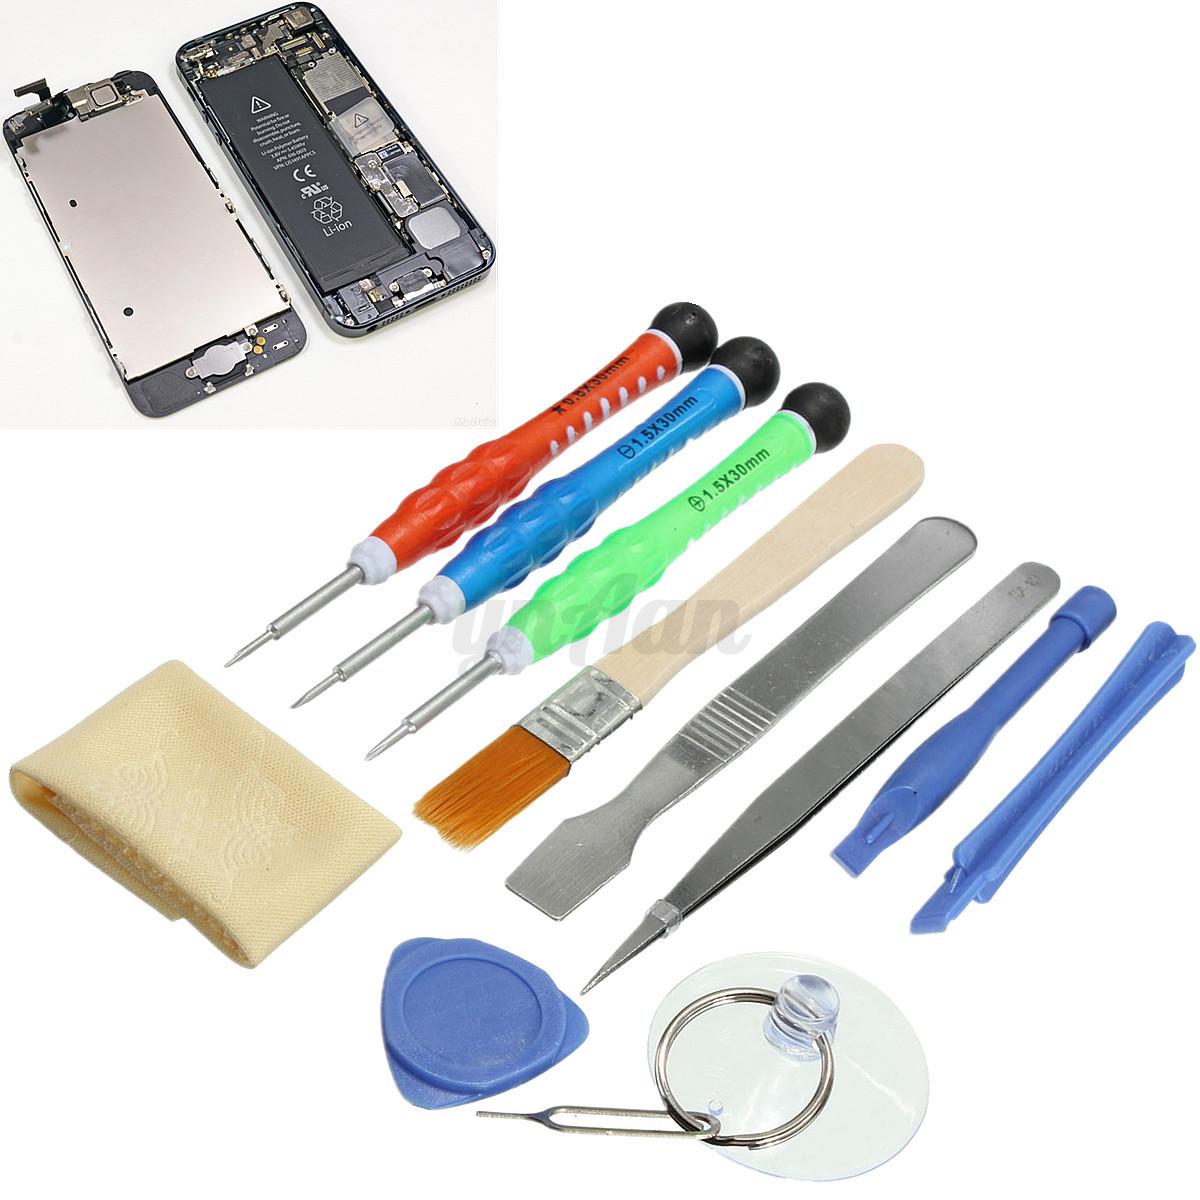 12 in 1 repair tools kit screwdrivers set for iphone 4s 5 5c 5s 6 6s plus lumia ebay. Black Bedroom Furniture Sets. Home Design Ideas